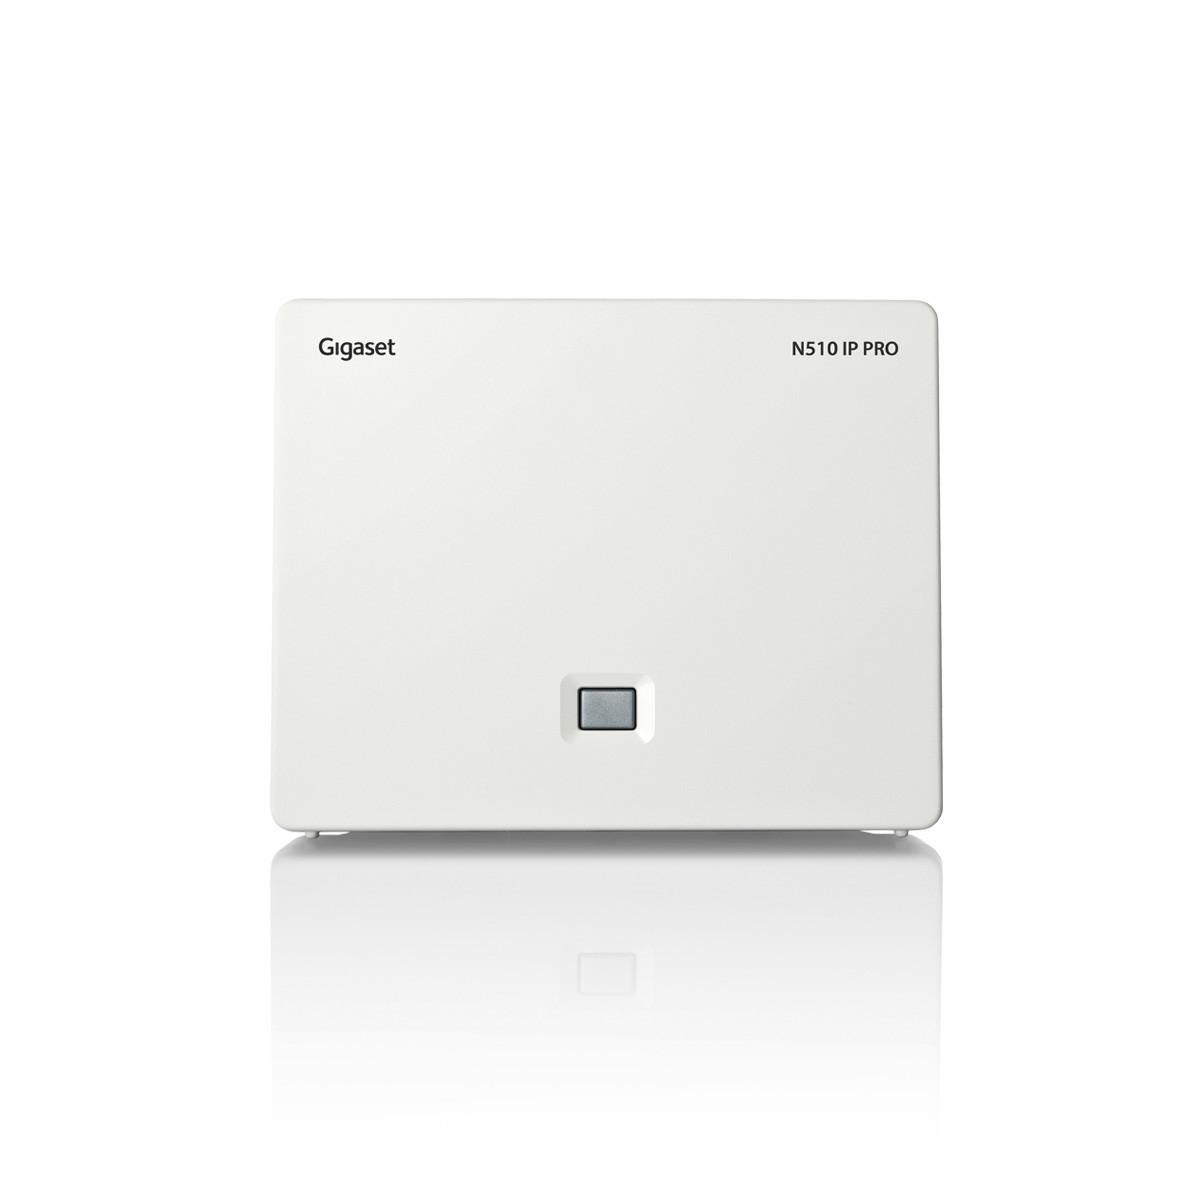 Gigaset N510 IP PRO